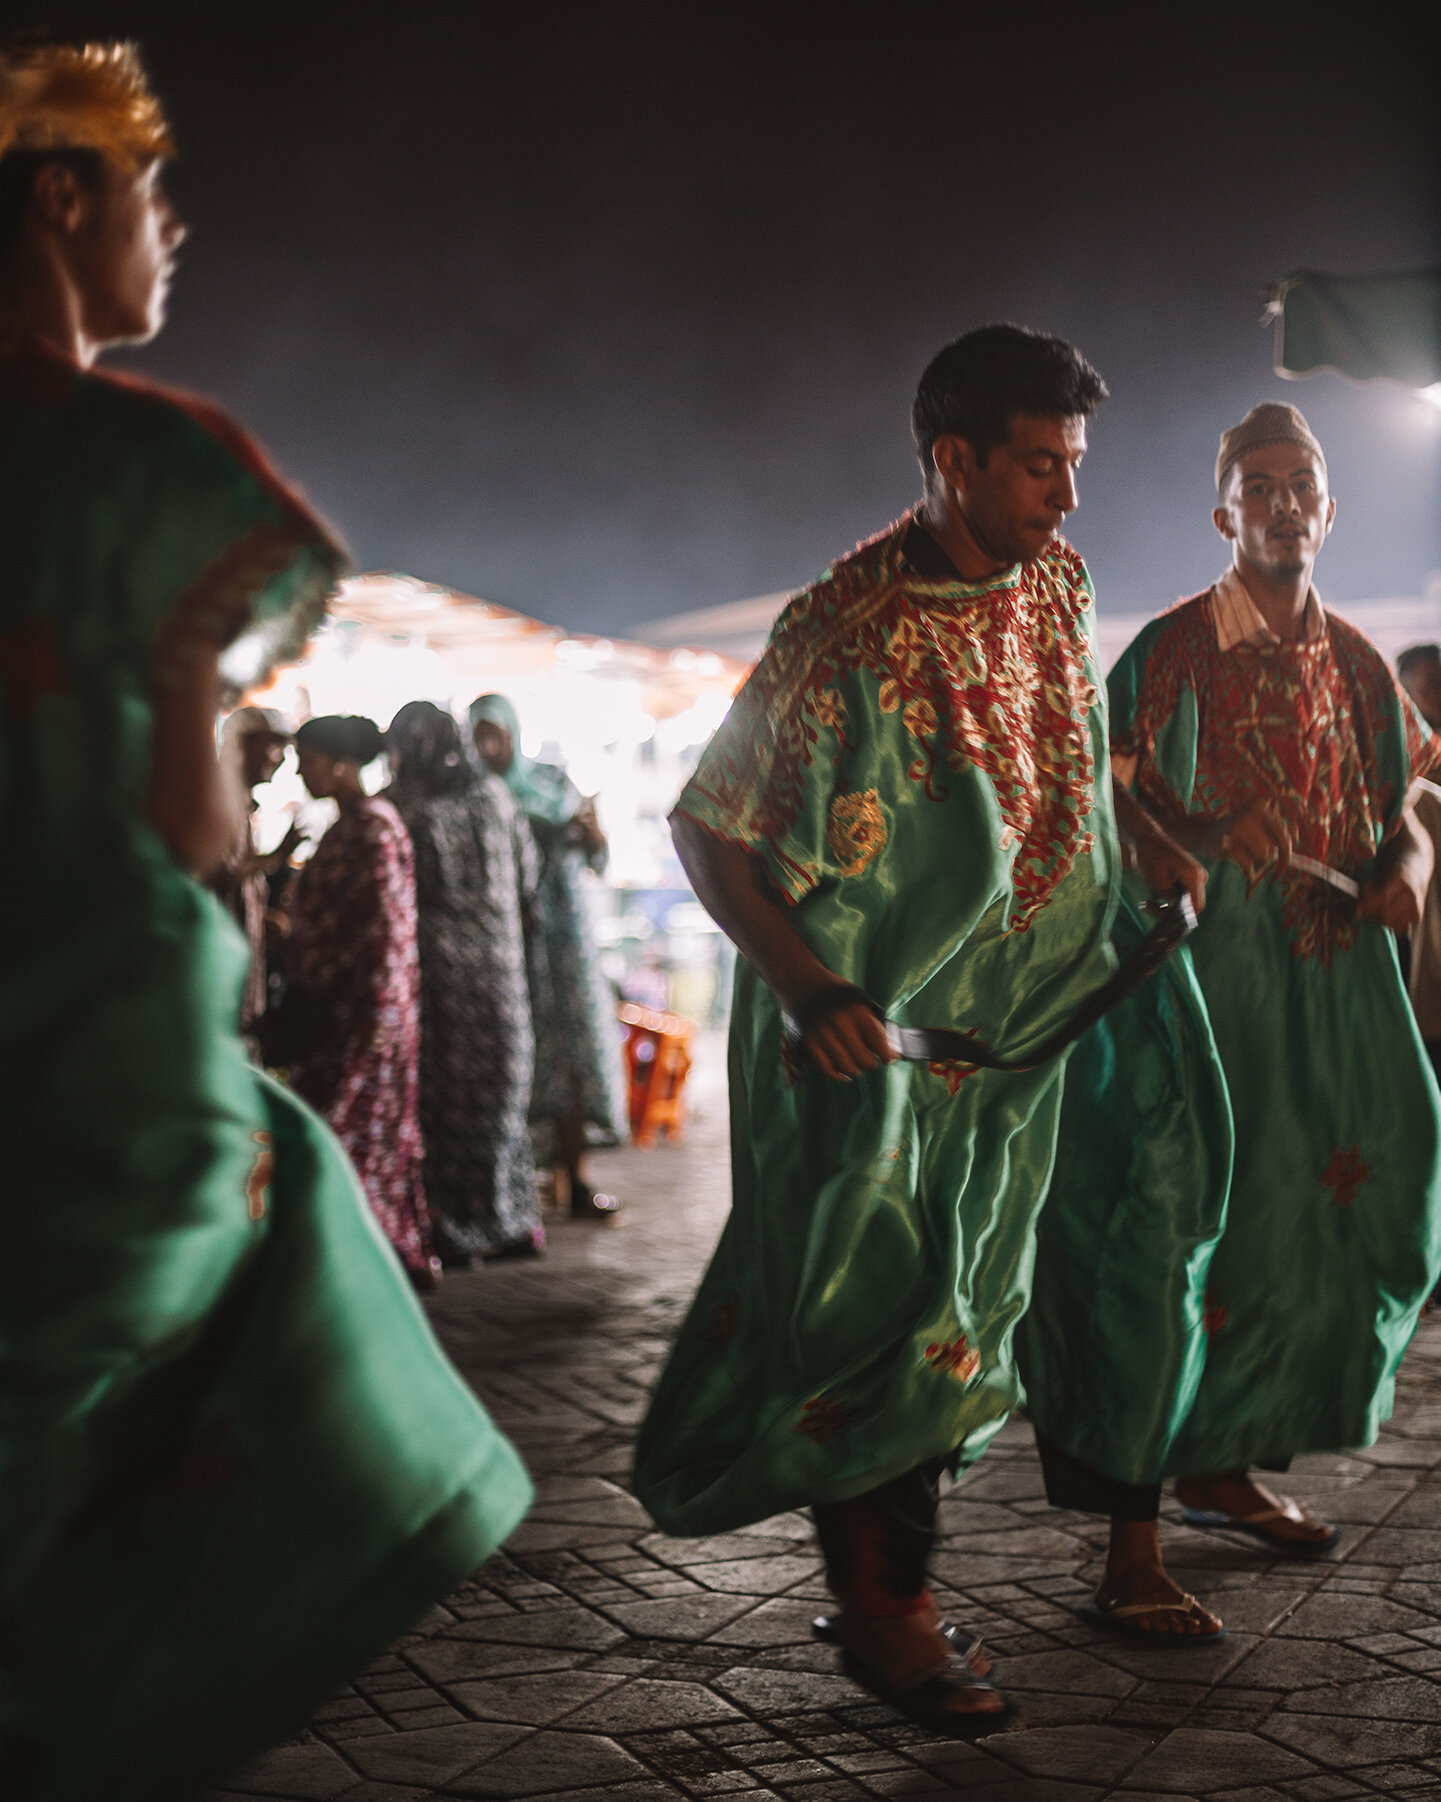 marrakech essential travel guide jemma el fna square traditions